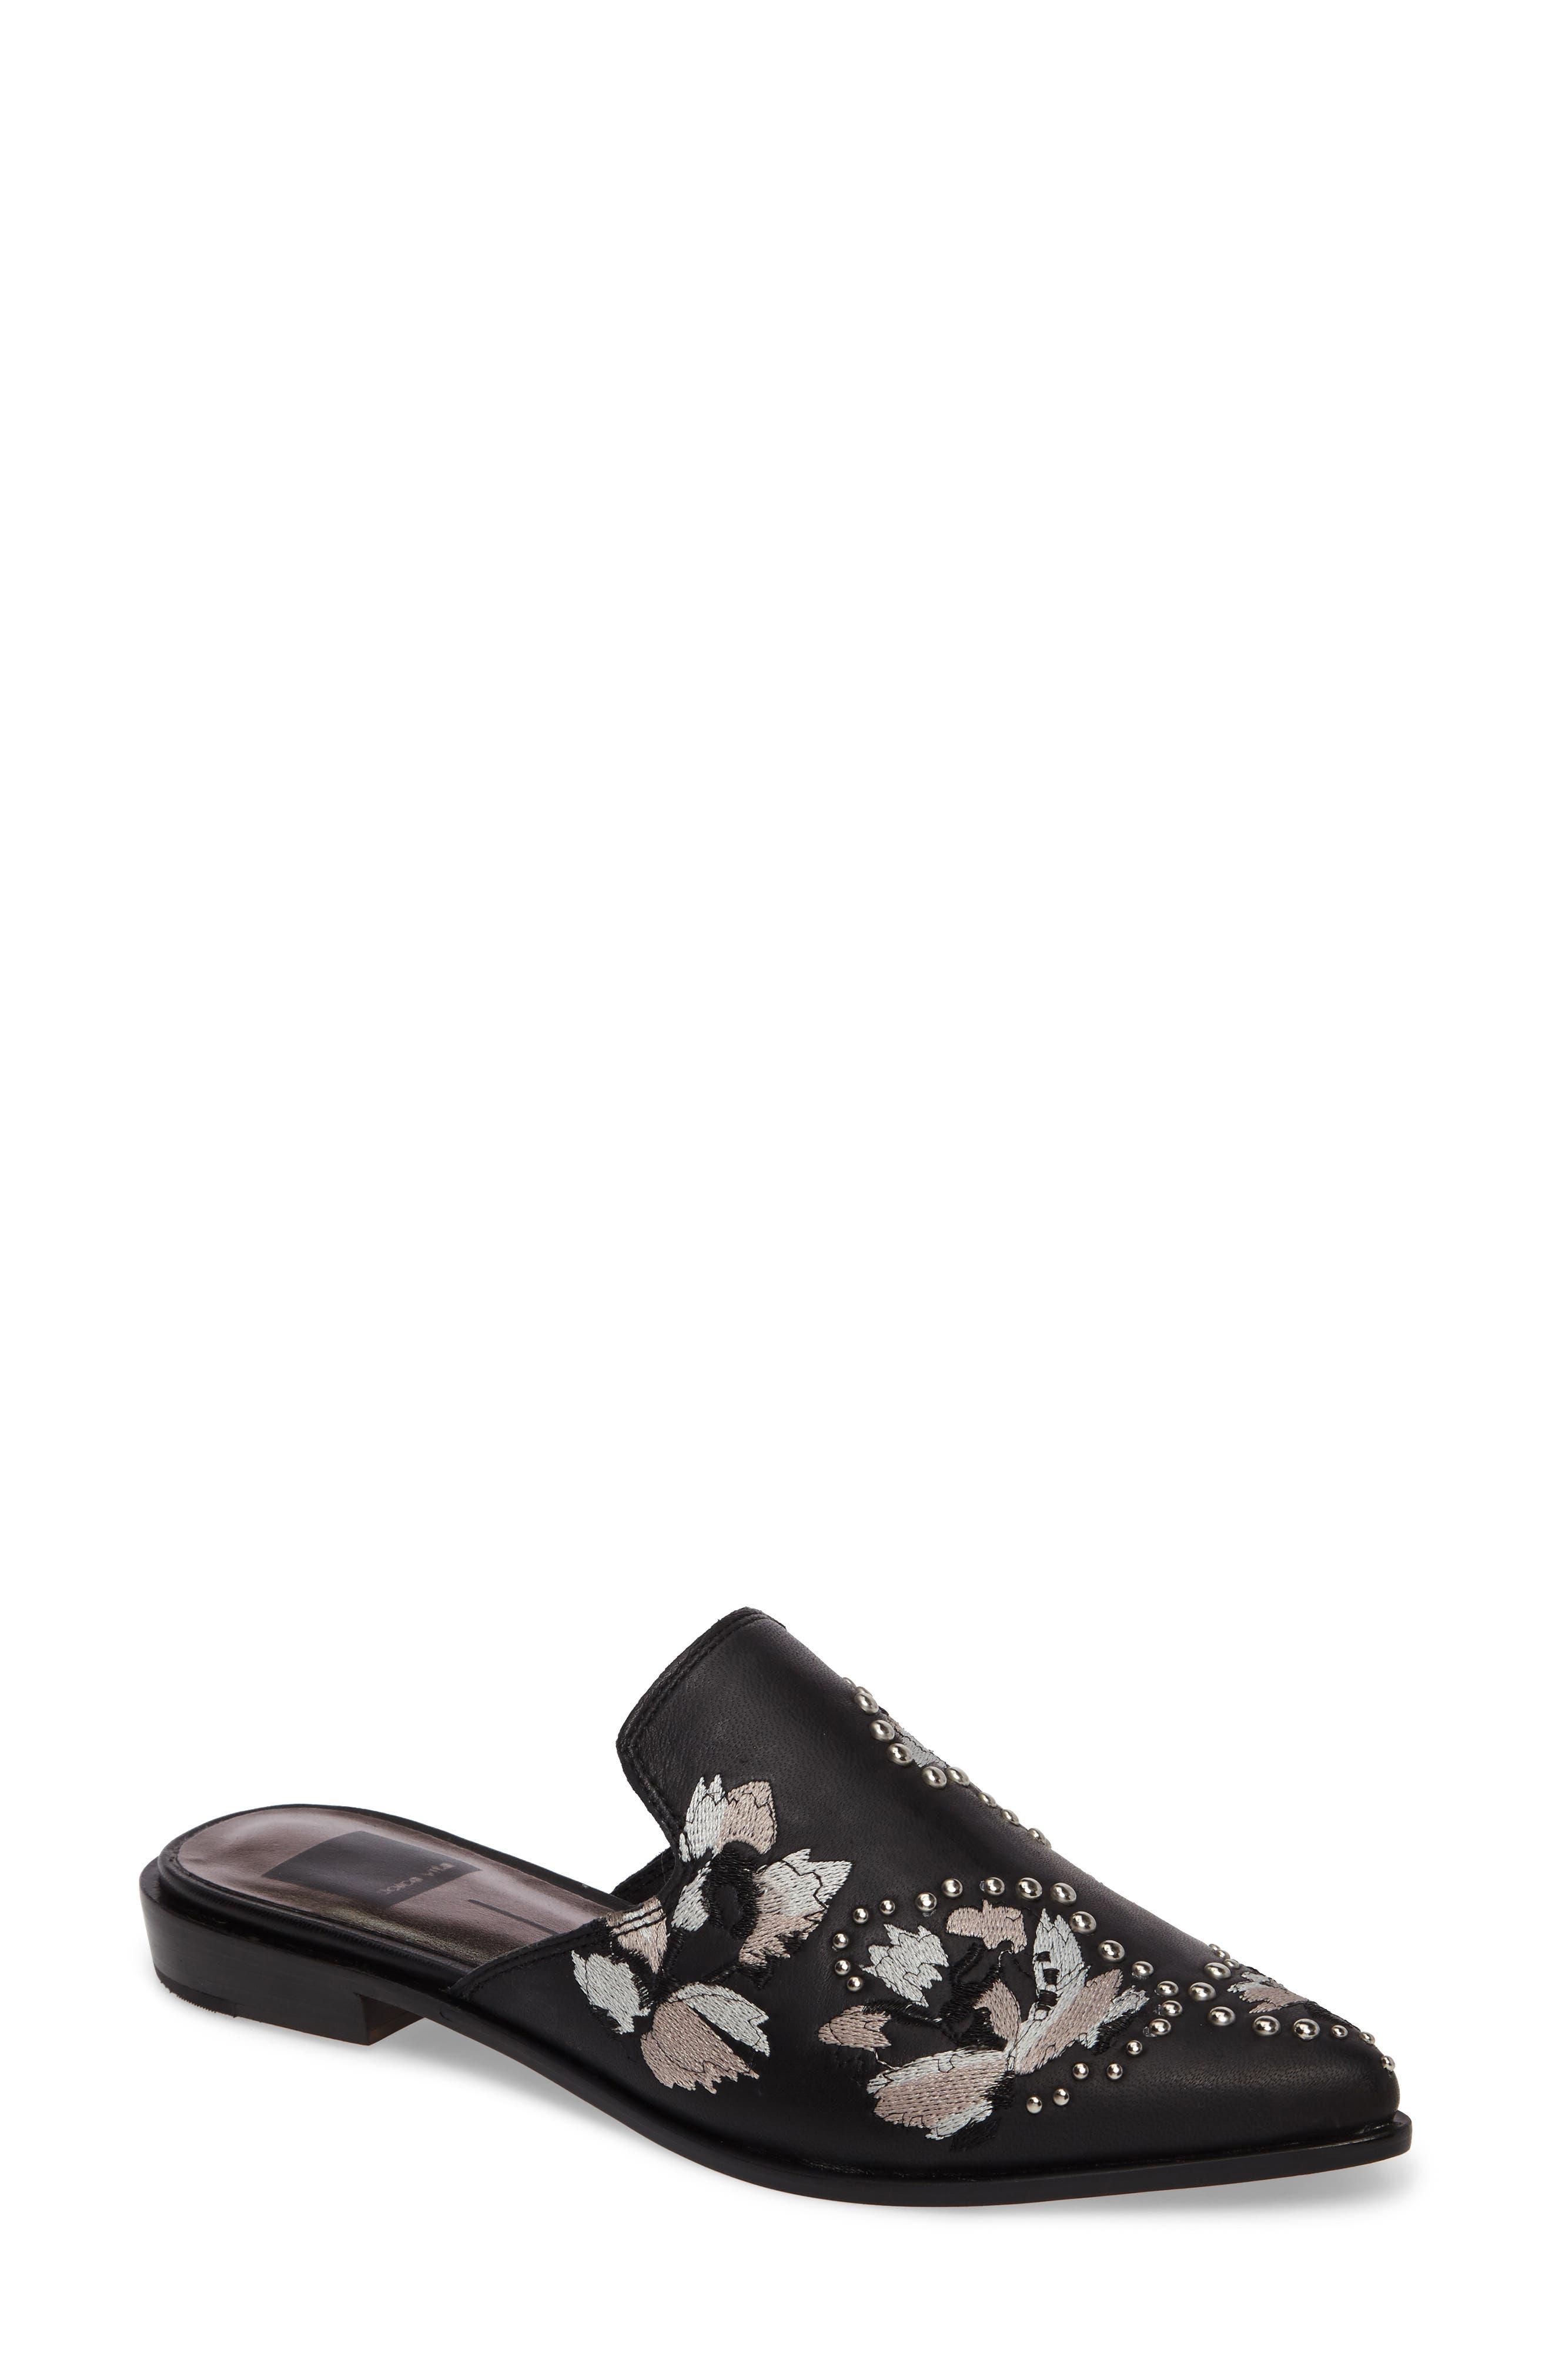 Harmony Embellished Loafer Mule,                         Main,                         color, Black Leather